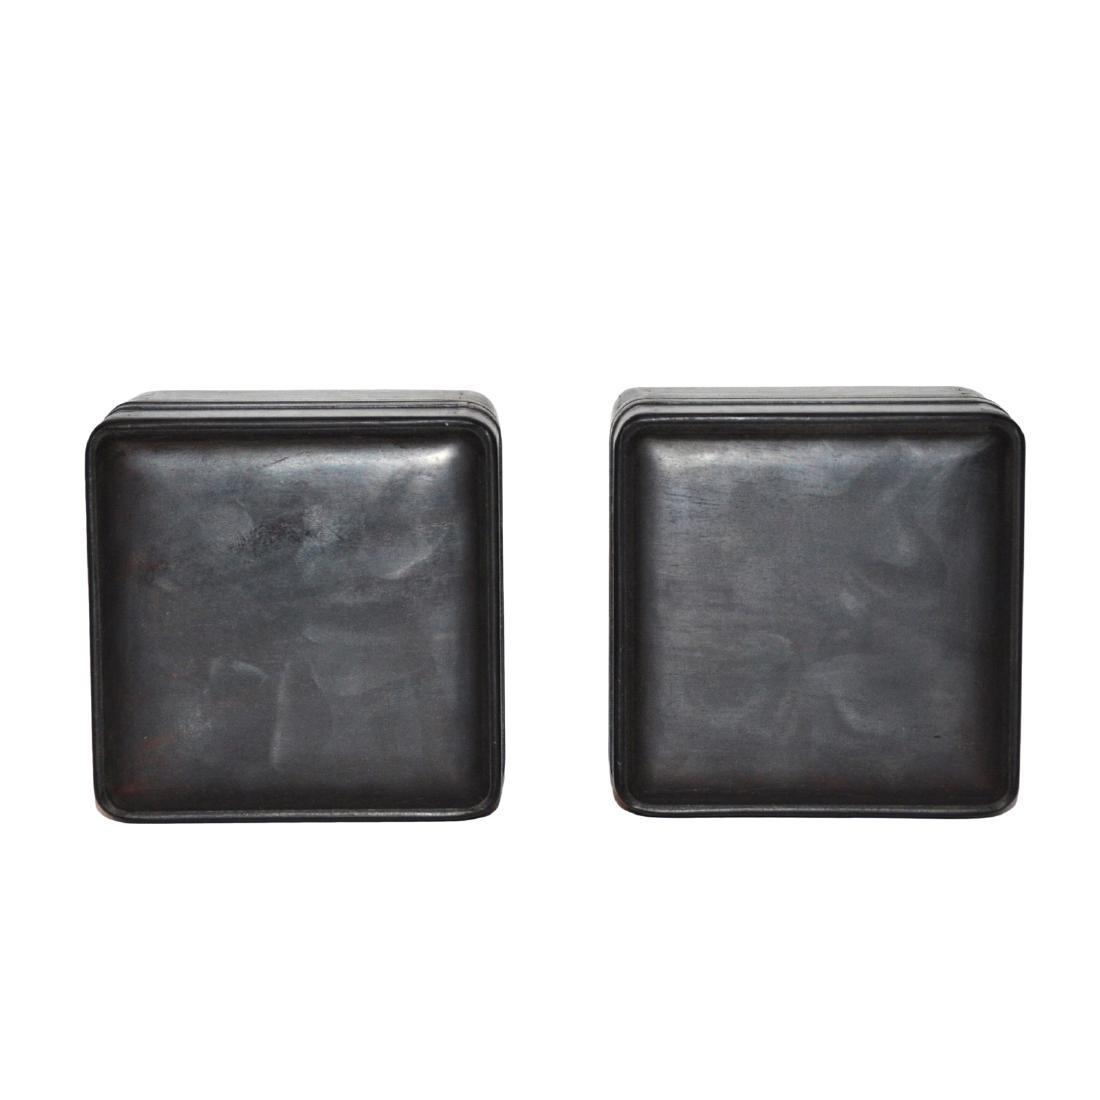 Qing, A Pair of Small Zitan Square Box - 5